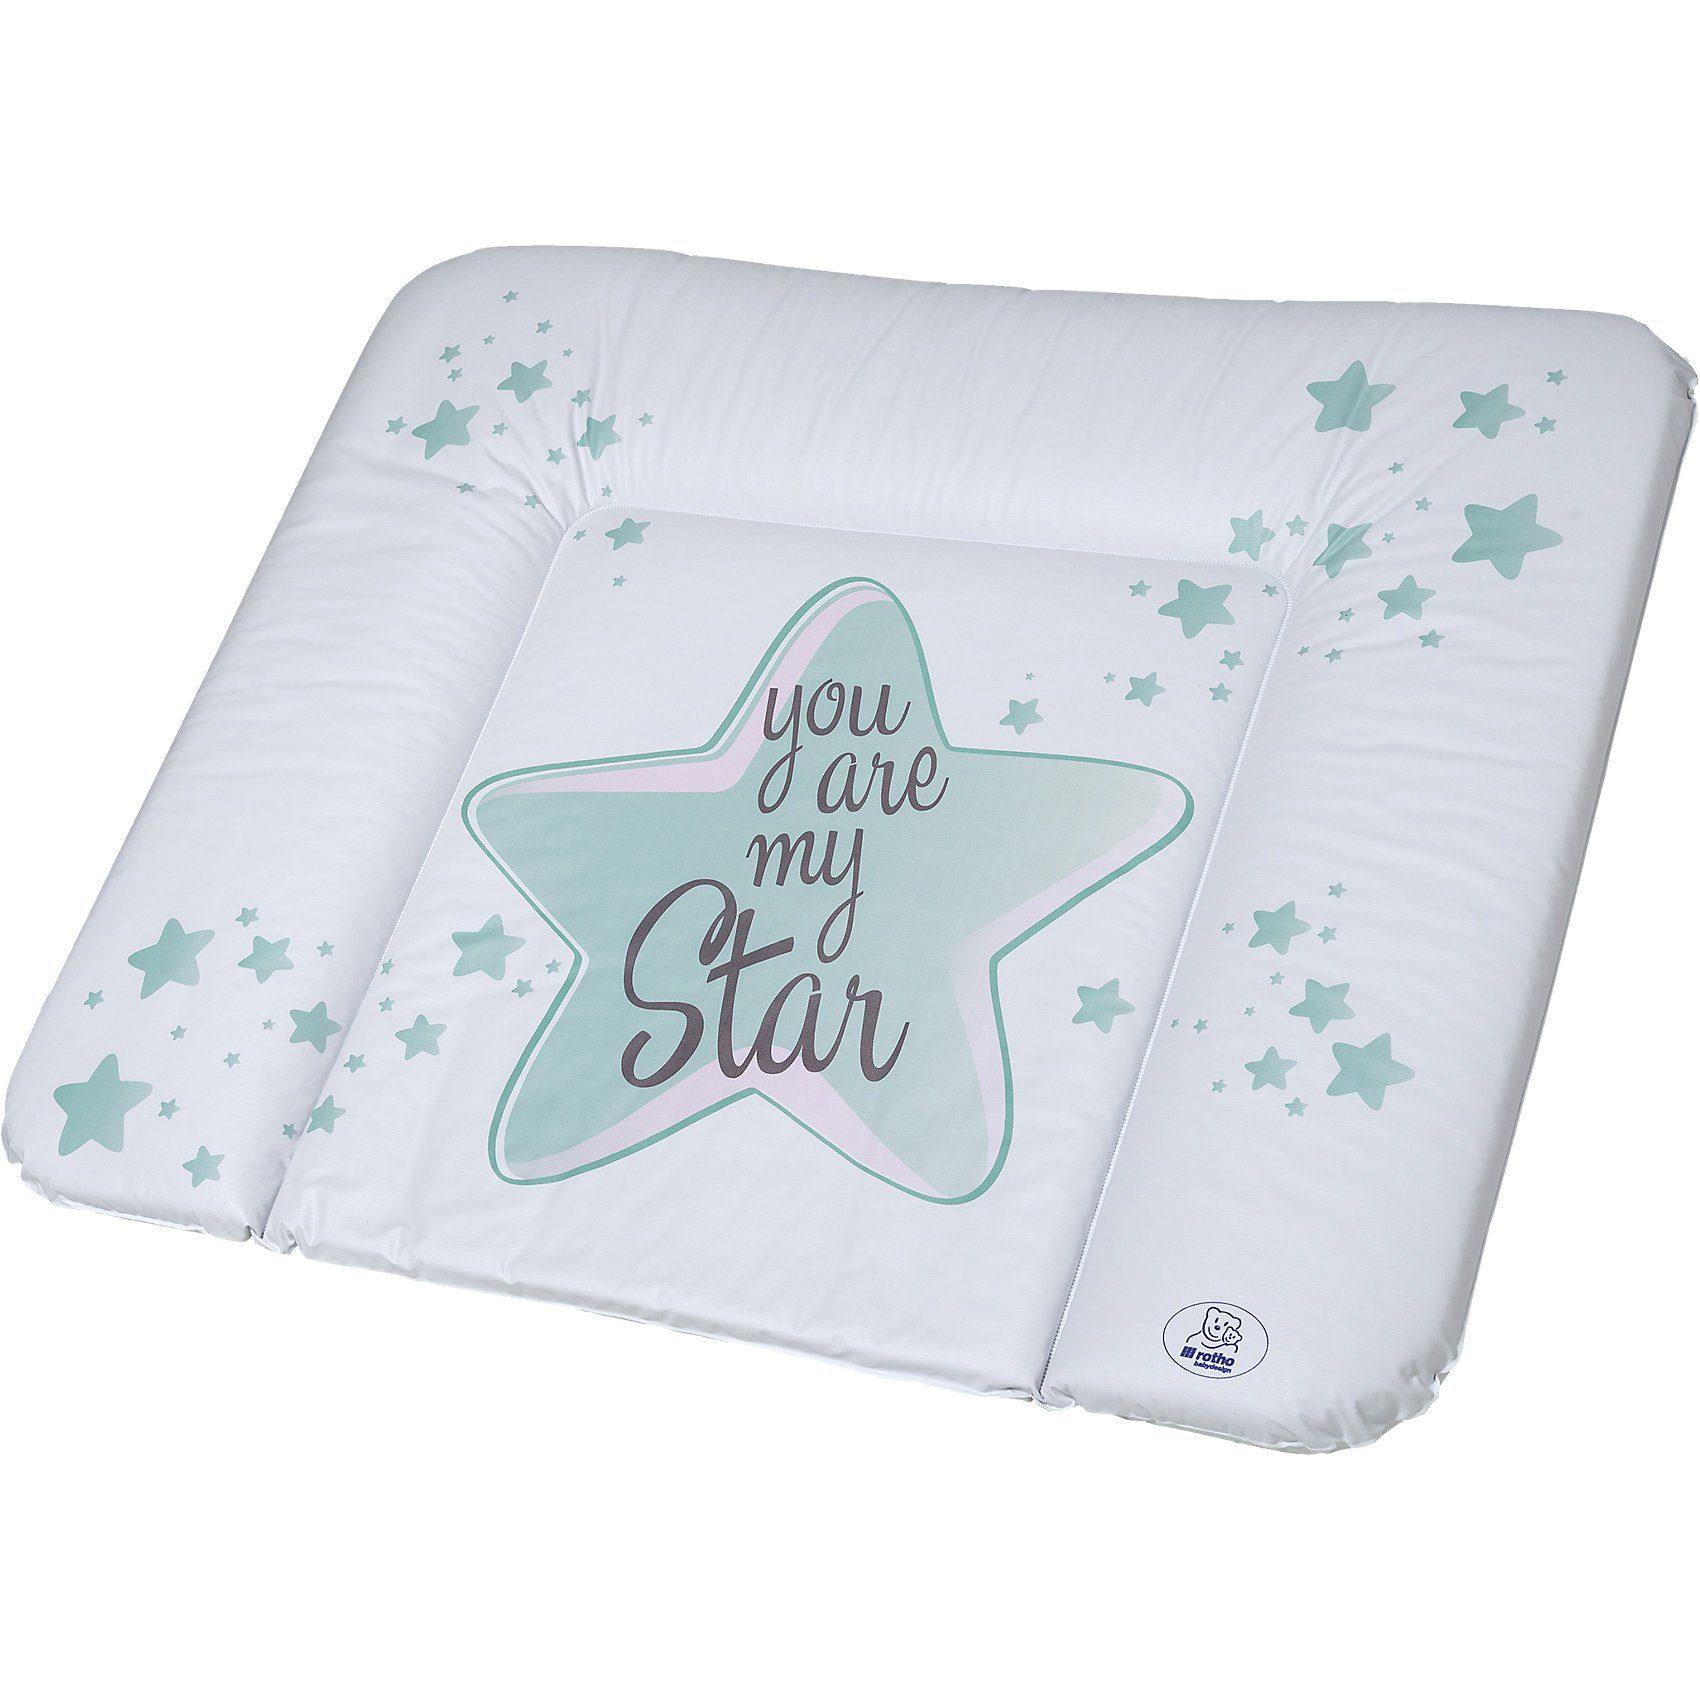 Rotho Babydesign Wickelauflage, You are my Star, swedish green, 85 x 72 cm